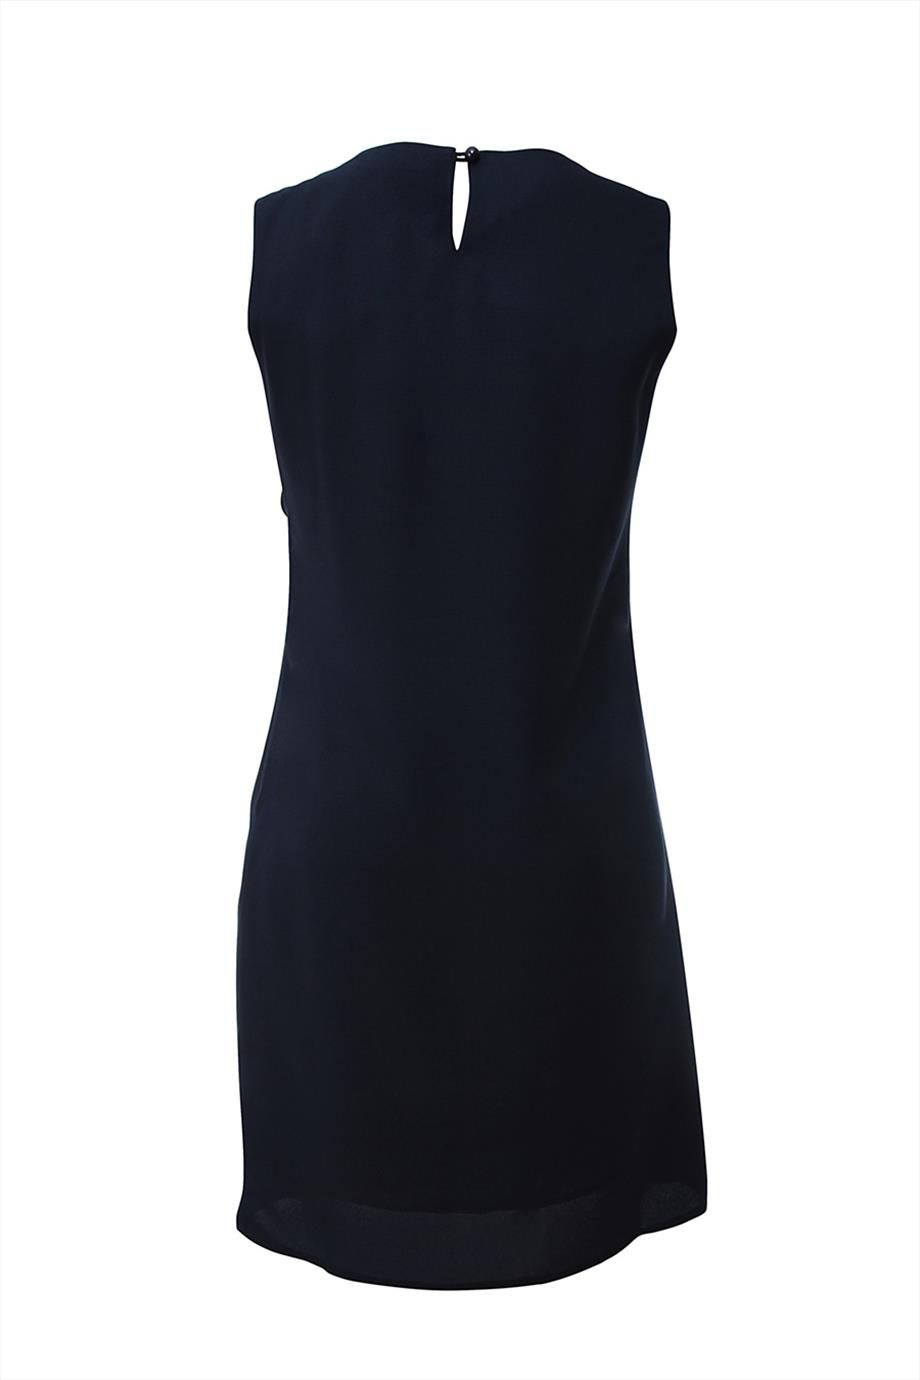 Axel accessories eshop fashion u clothing st century dress